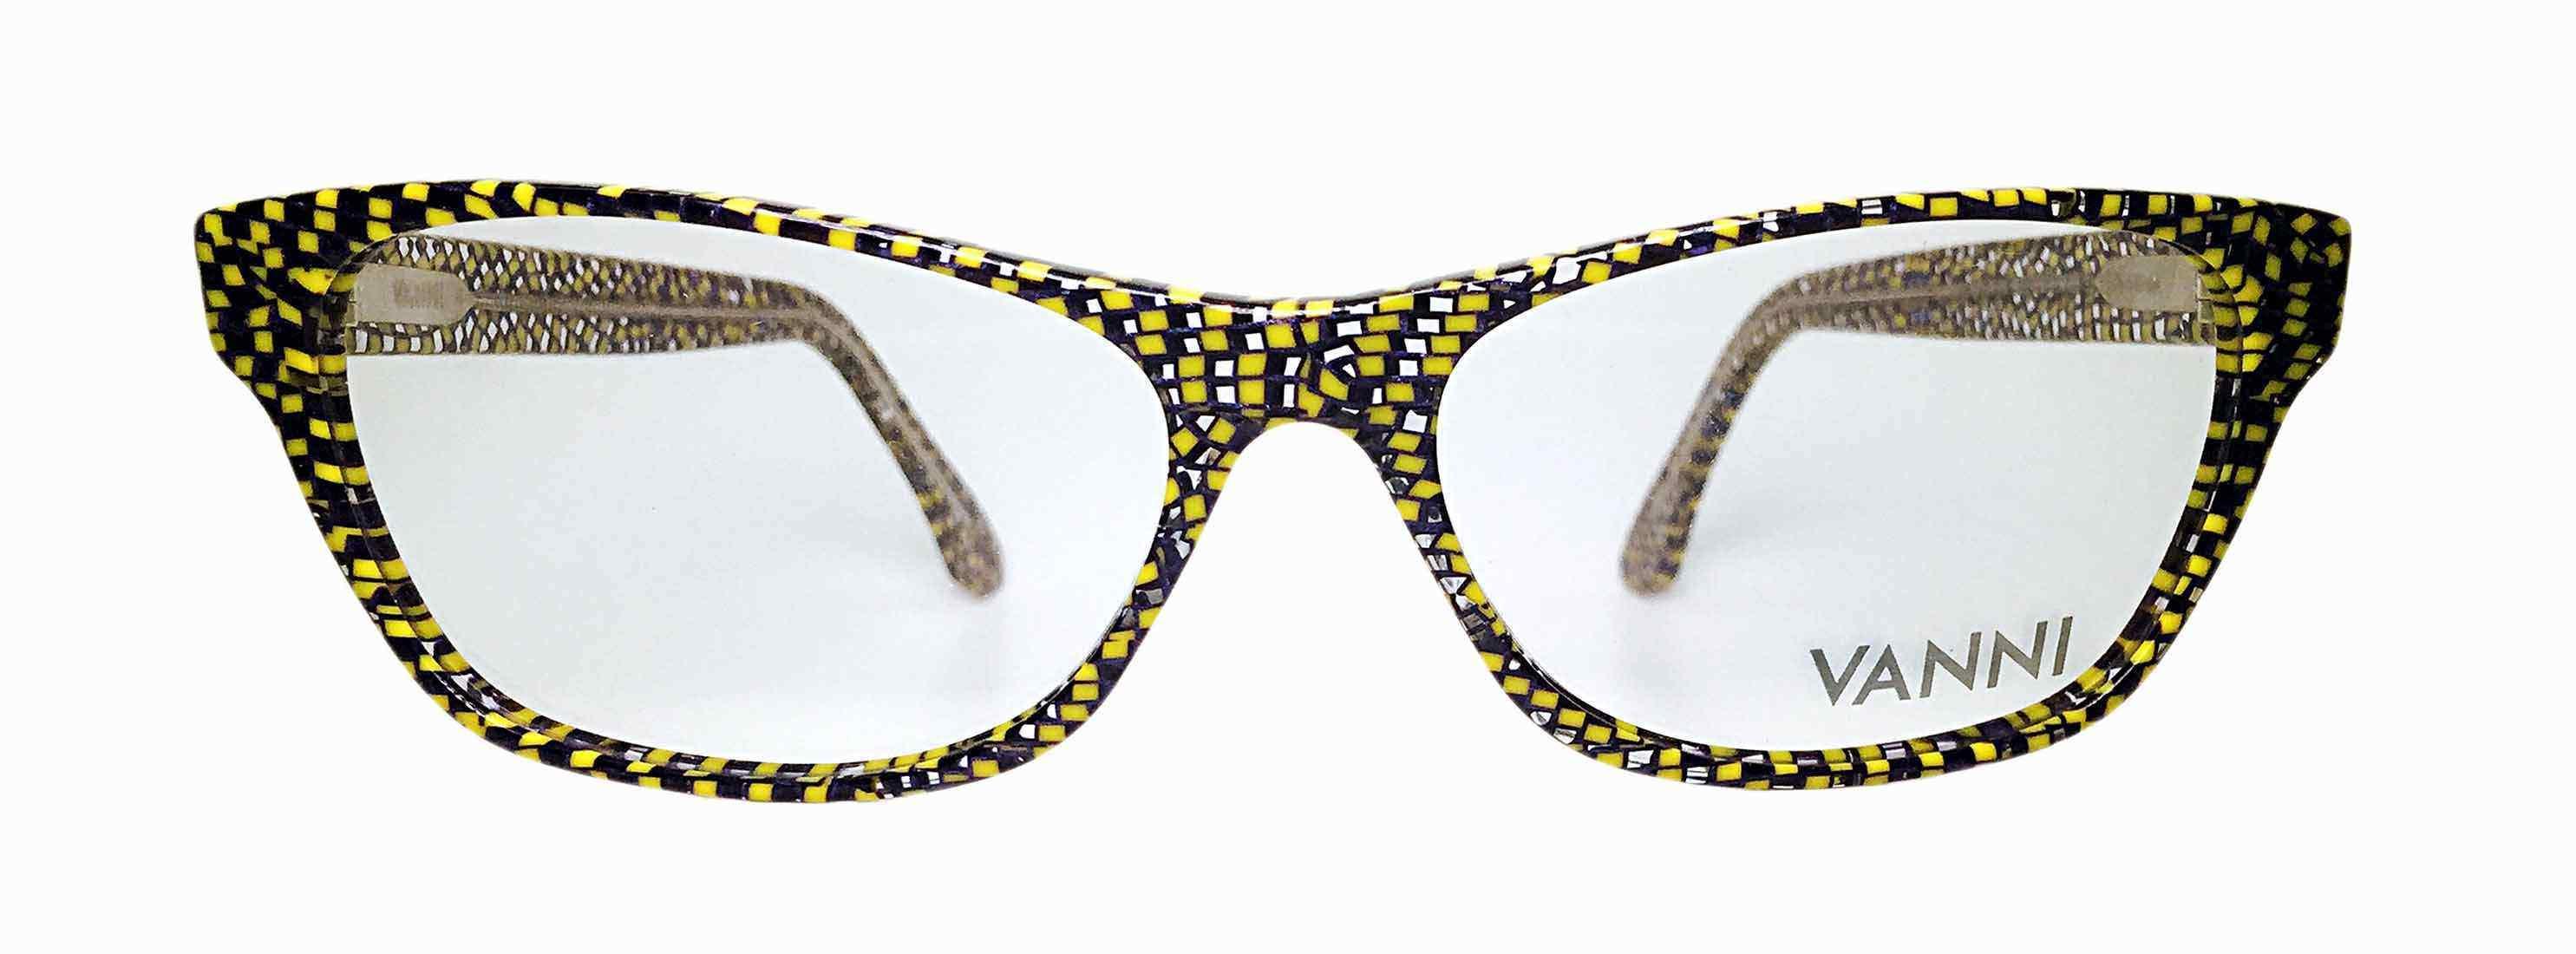 Vanni spectacles 1922 A500 01 2970x1100